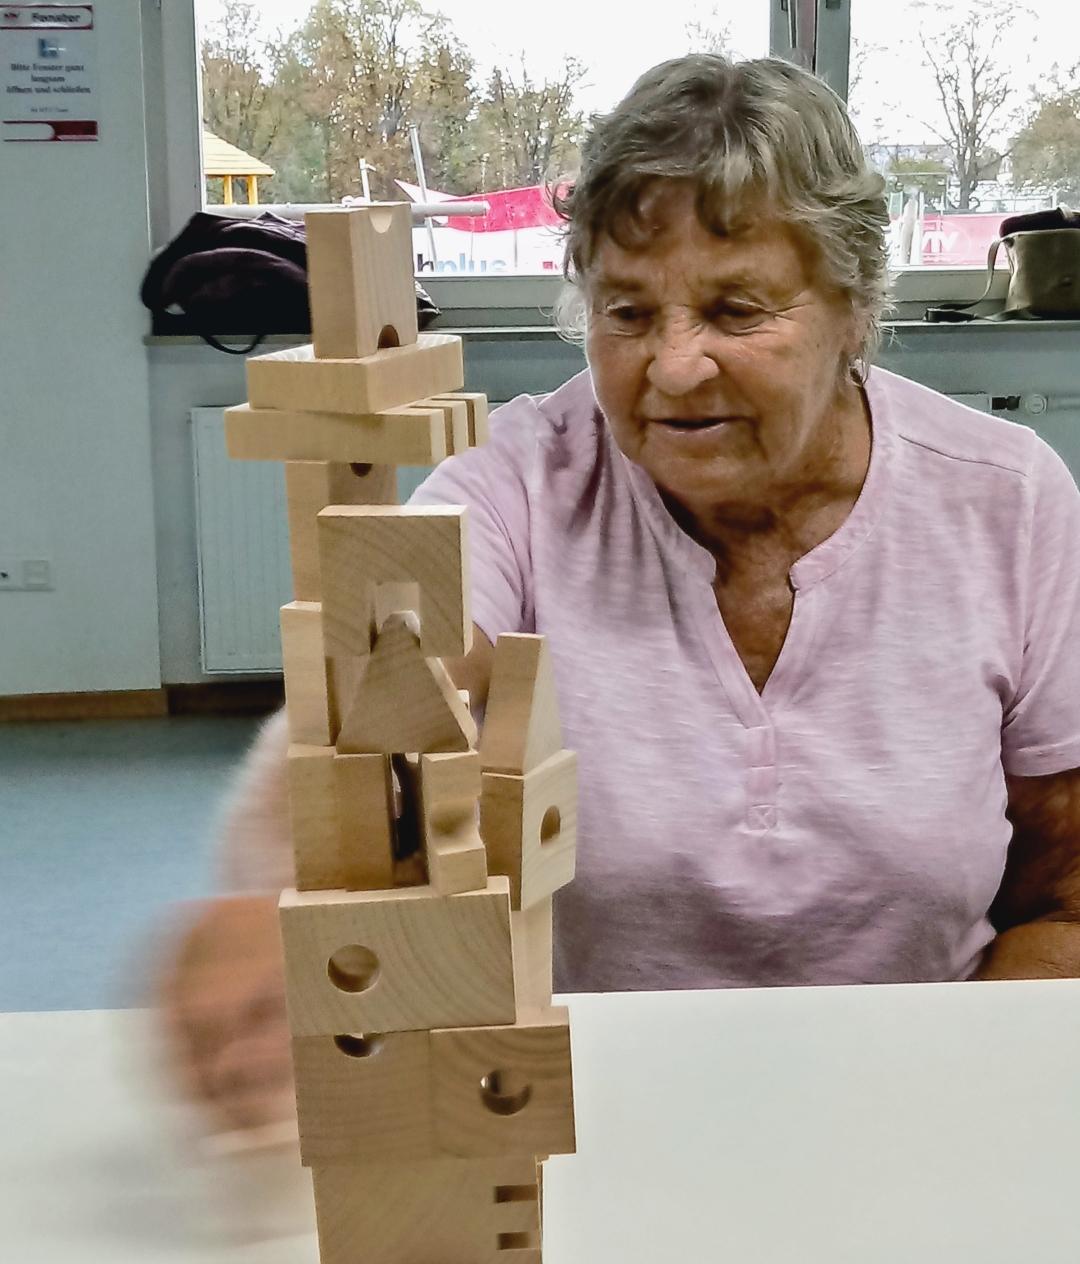 Seniorenclub 11 - Seniorenclub